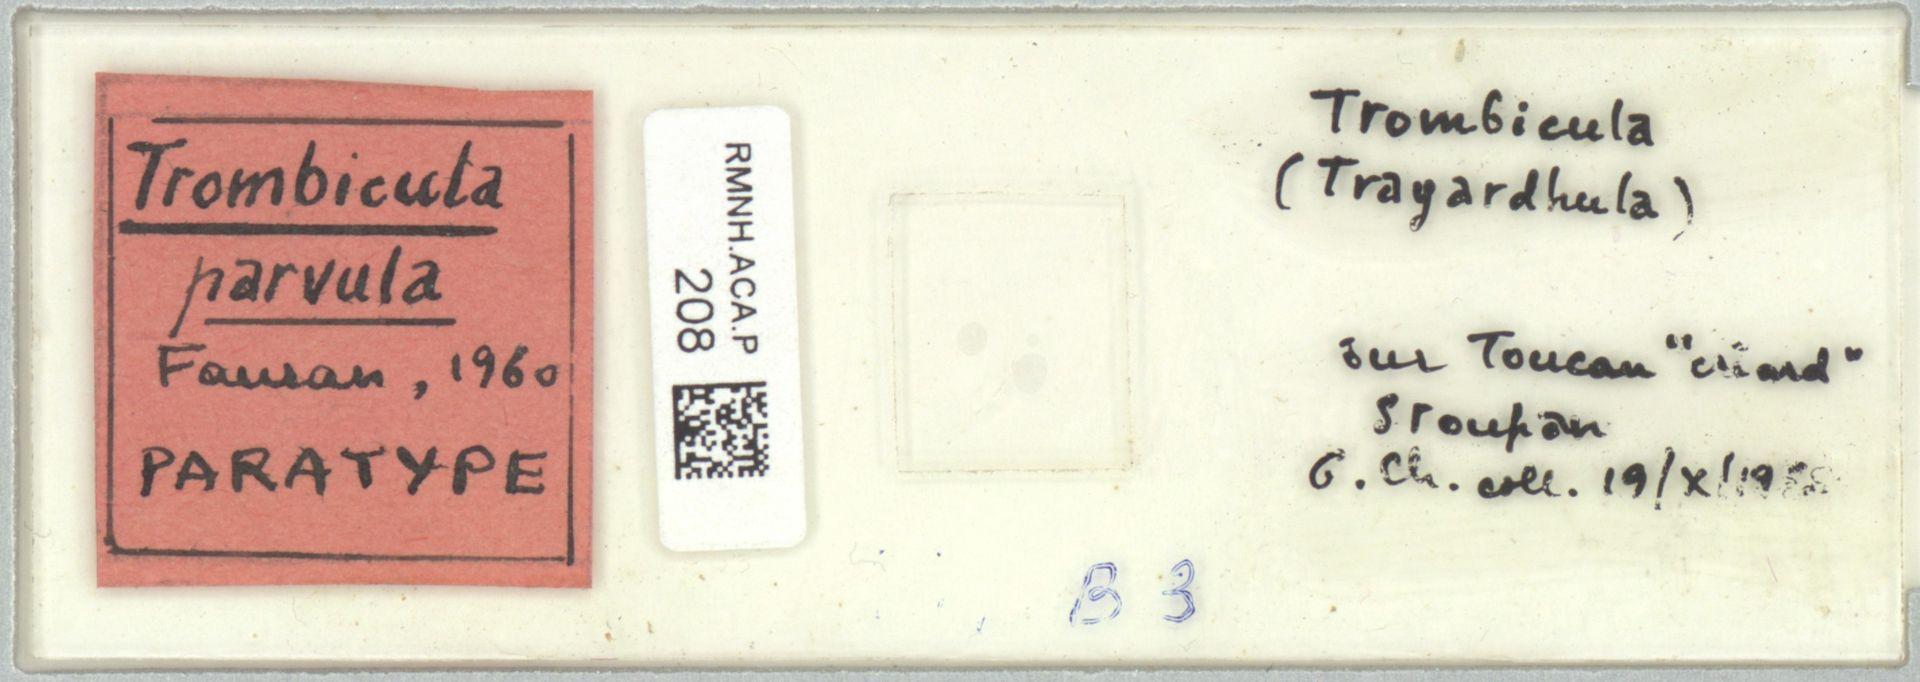 RMNH.ACA.P.208 | Trombicula parvula Fauran, 1960